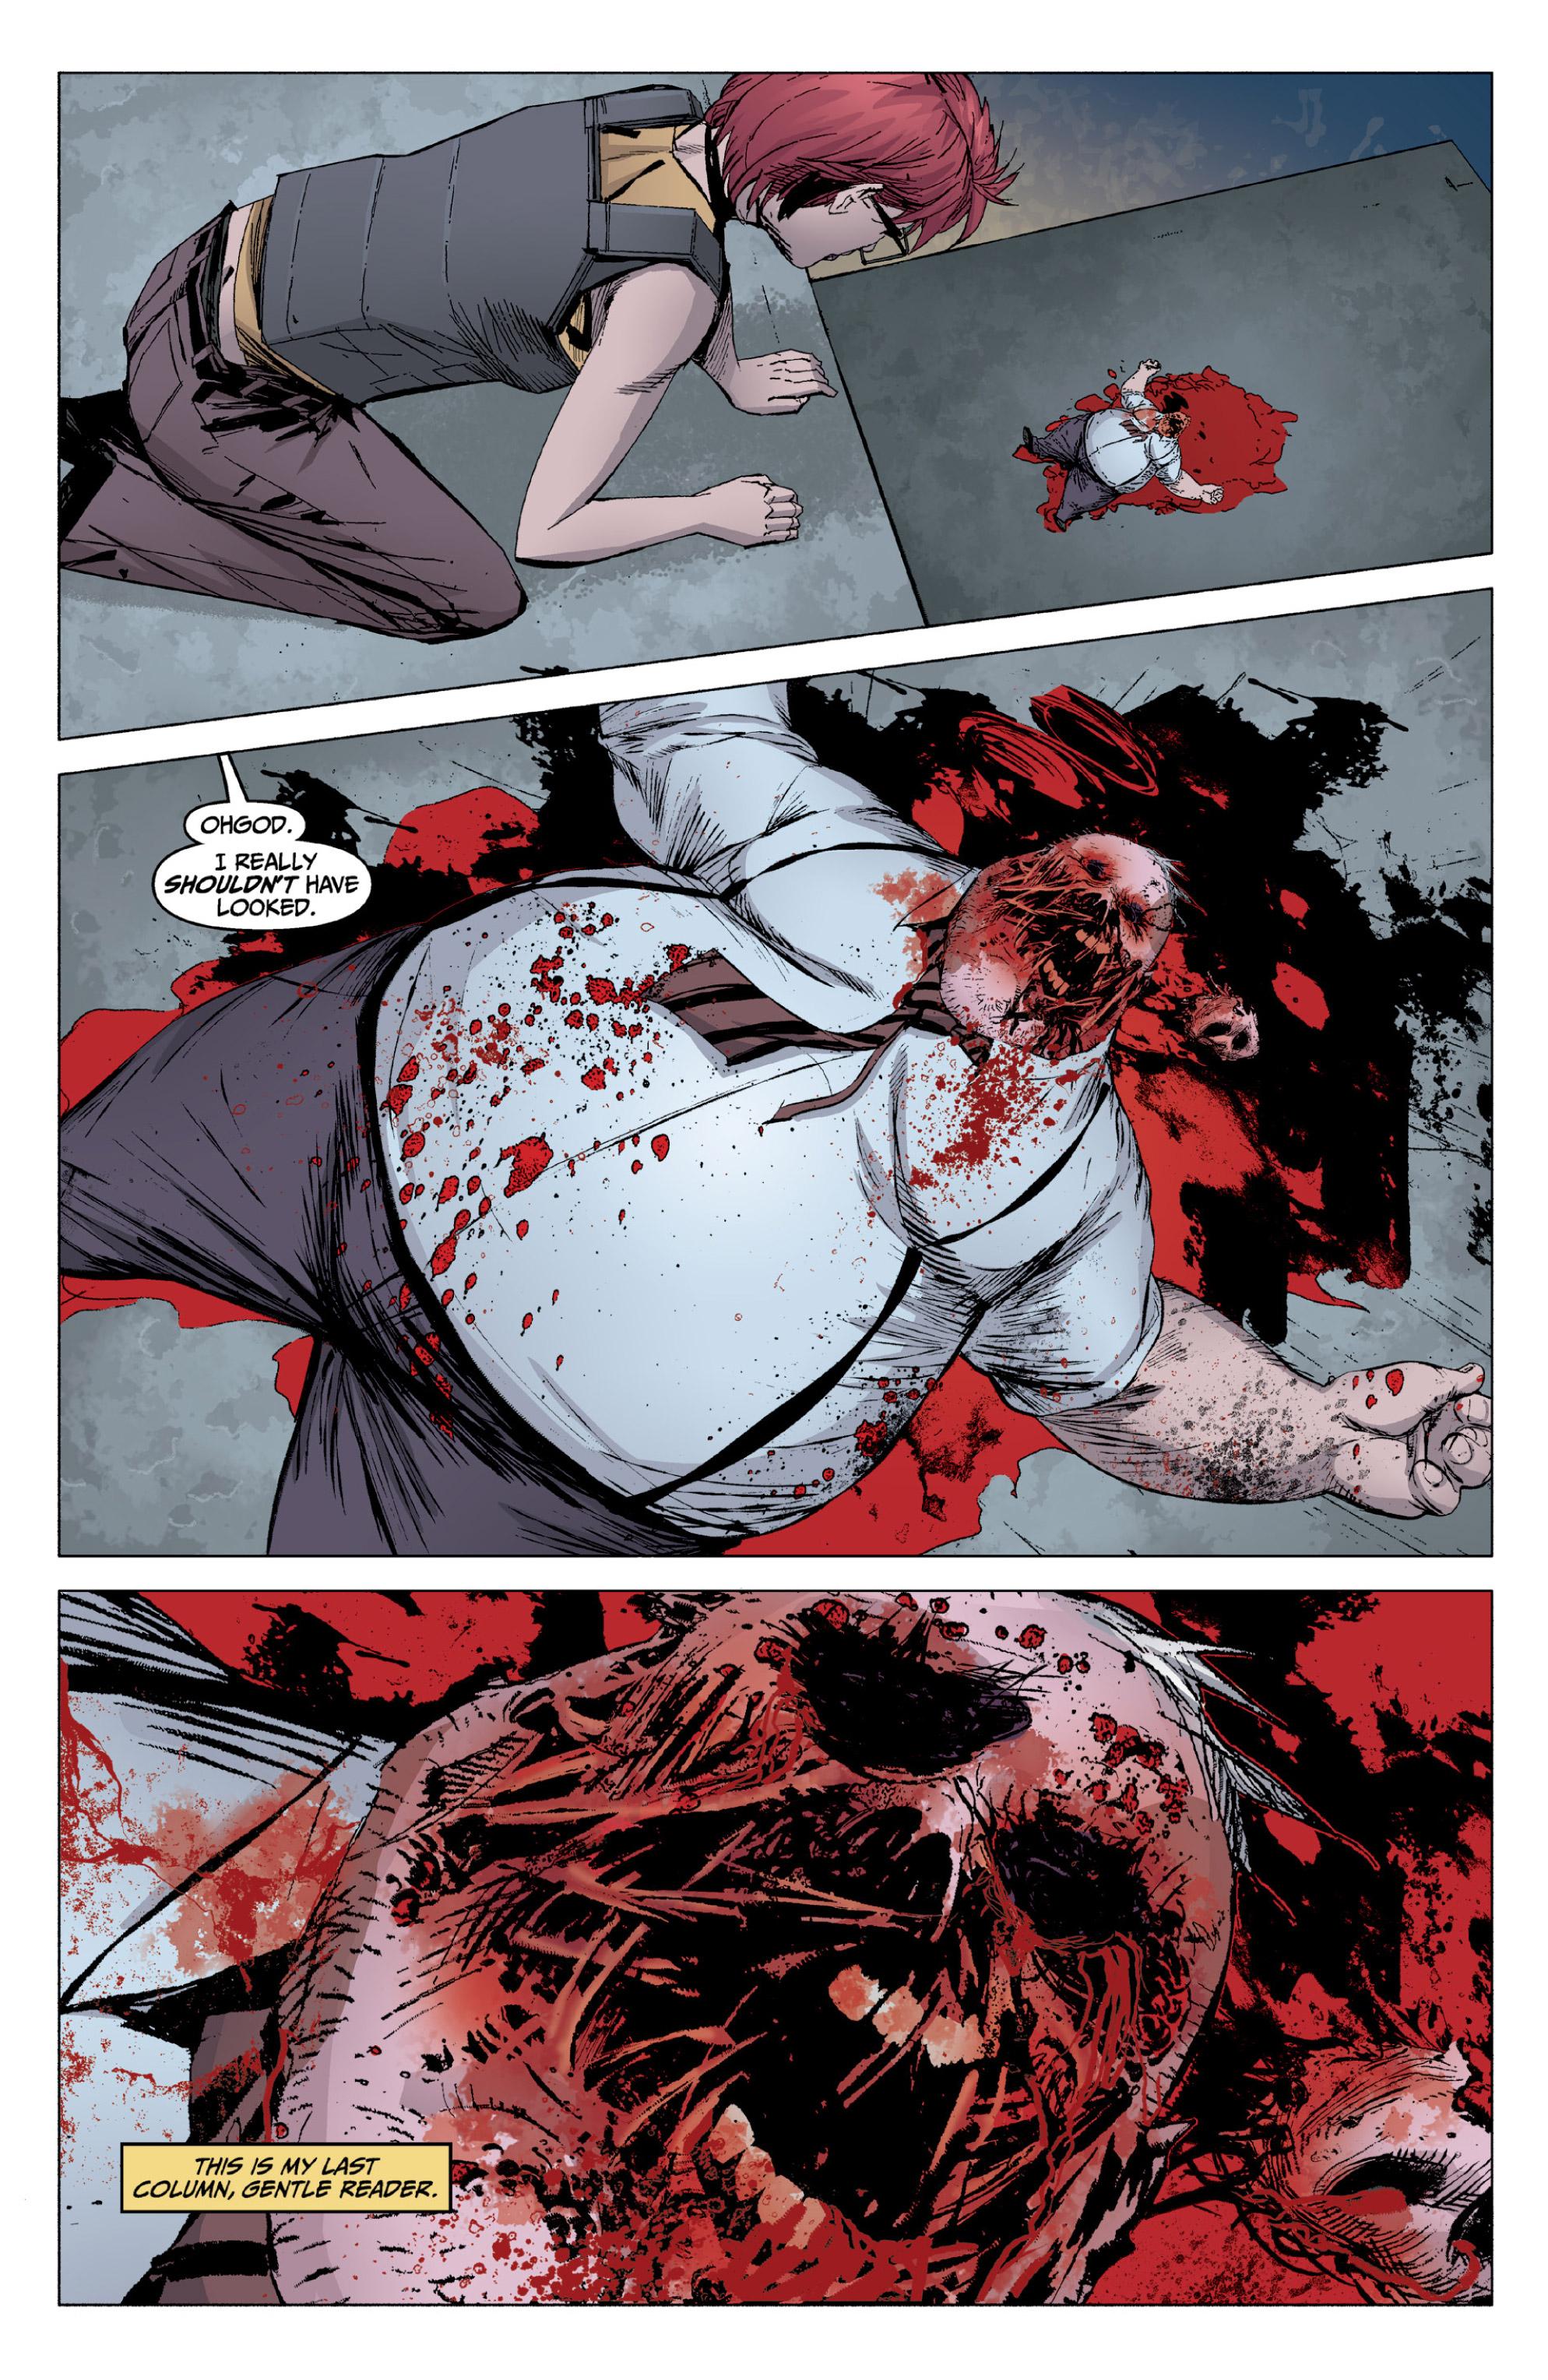 Read online X: Big Bad comic -  Issue # Full - 121